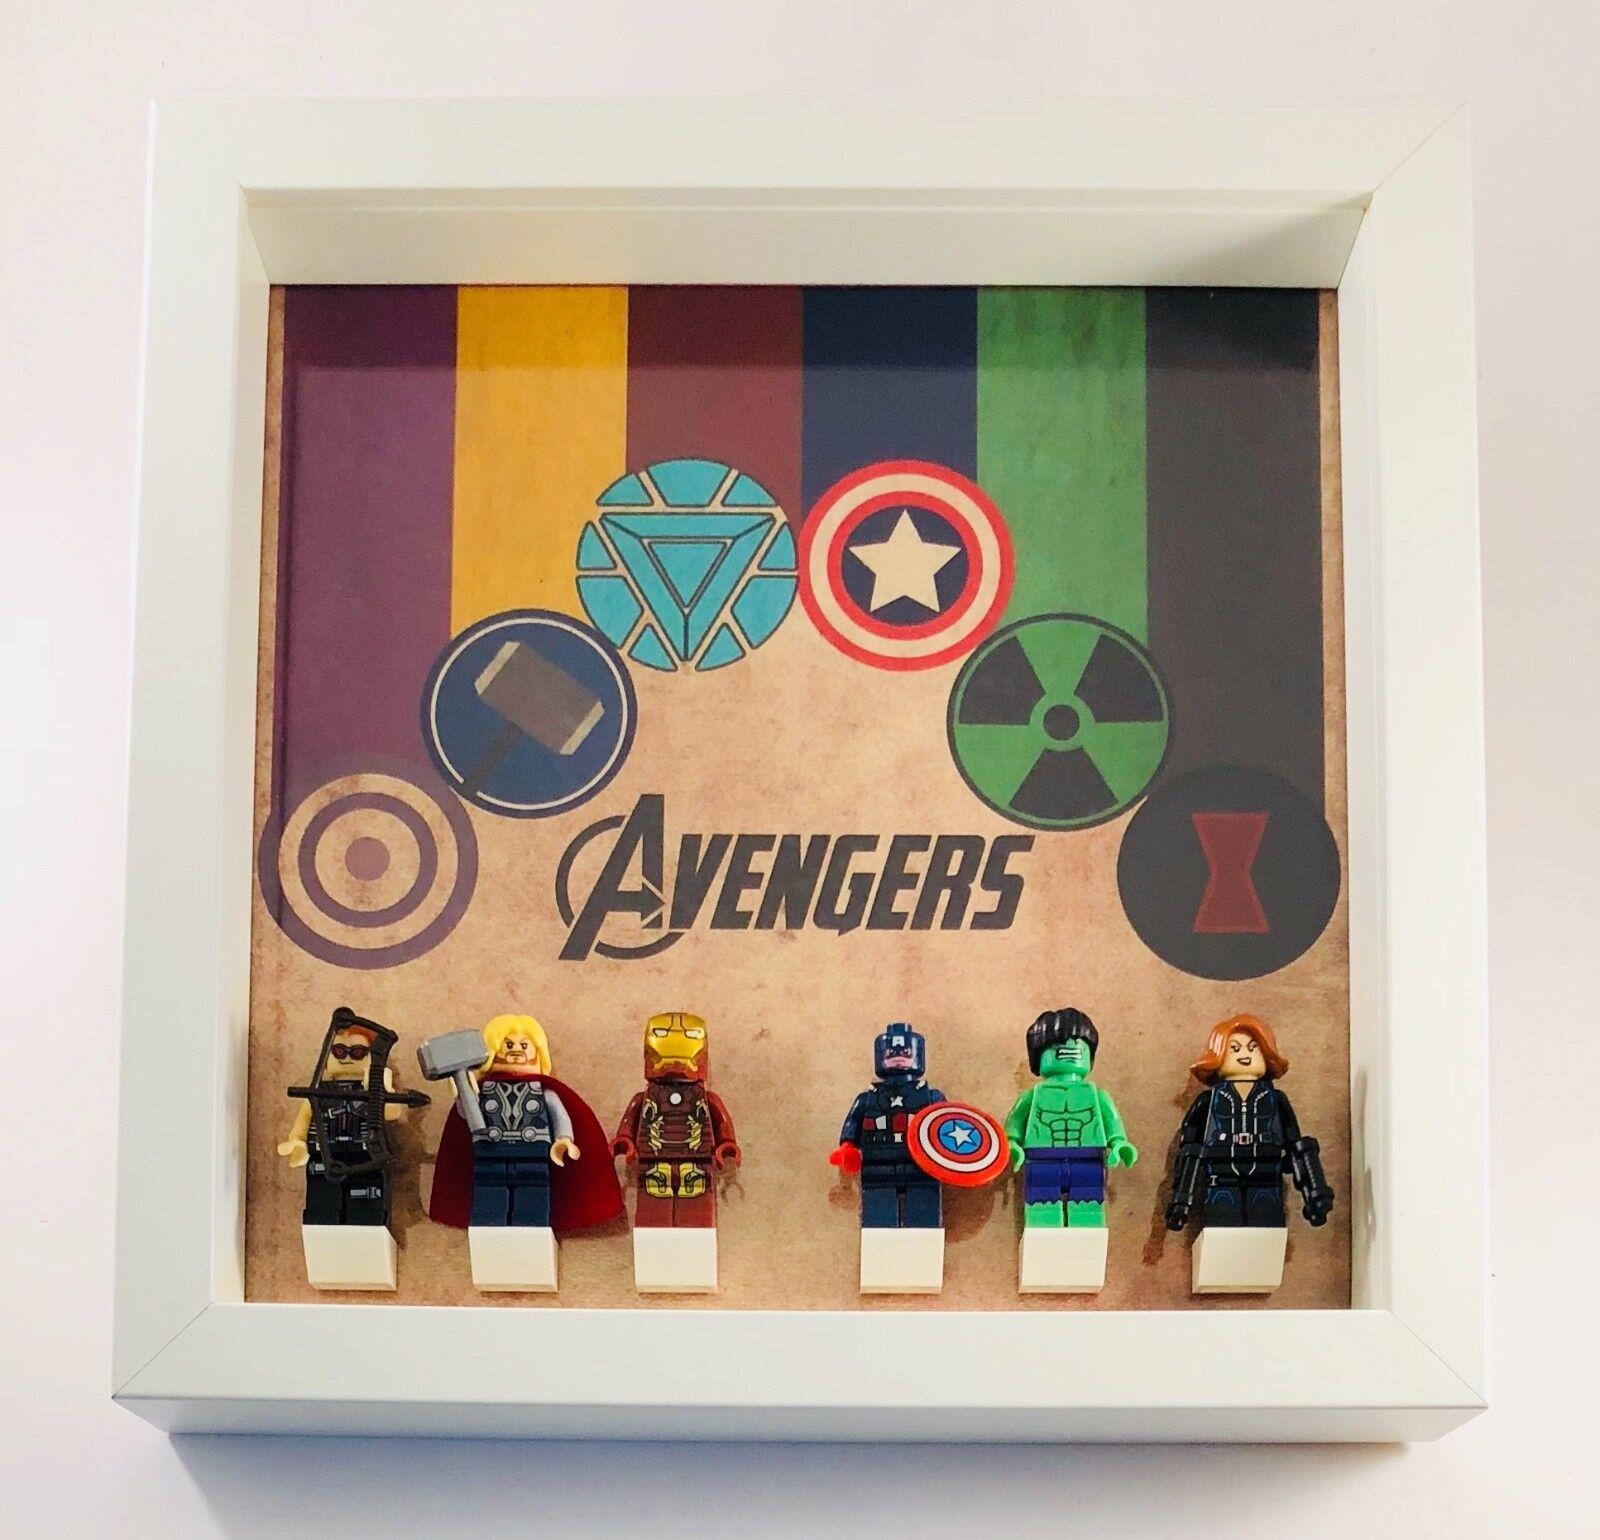 Display Frame for LEGO Marvel The Avengers Minifigures